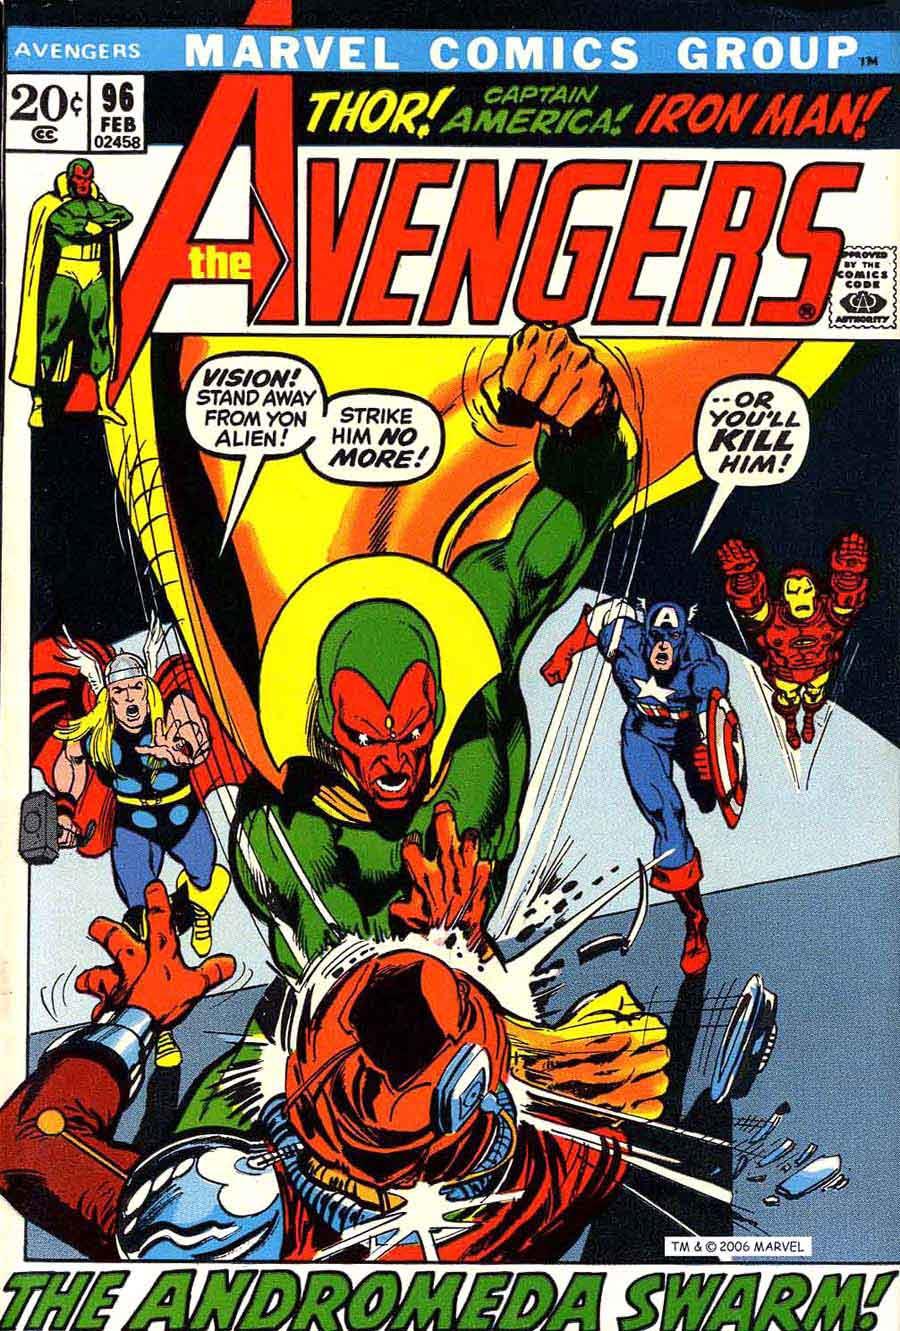 Avengers v1 #96 marvel comic book cover art by Neal Adams